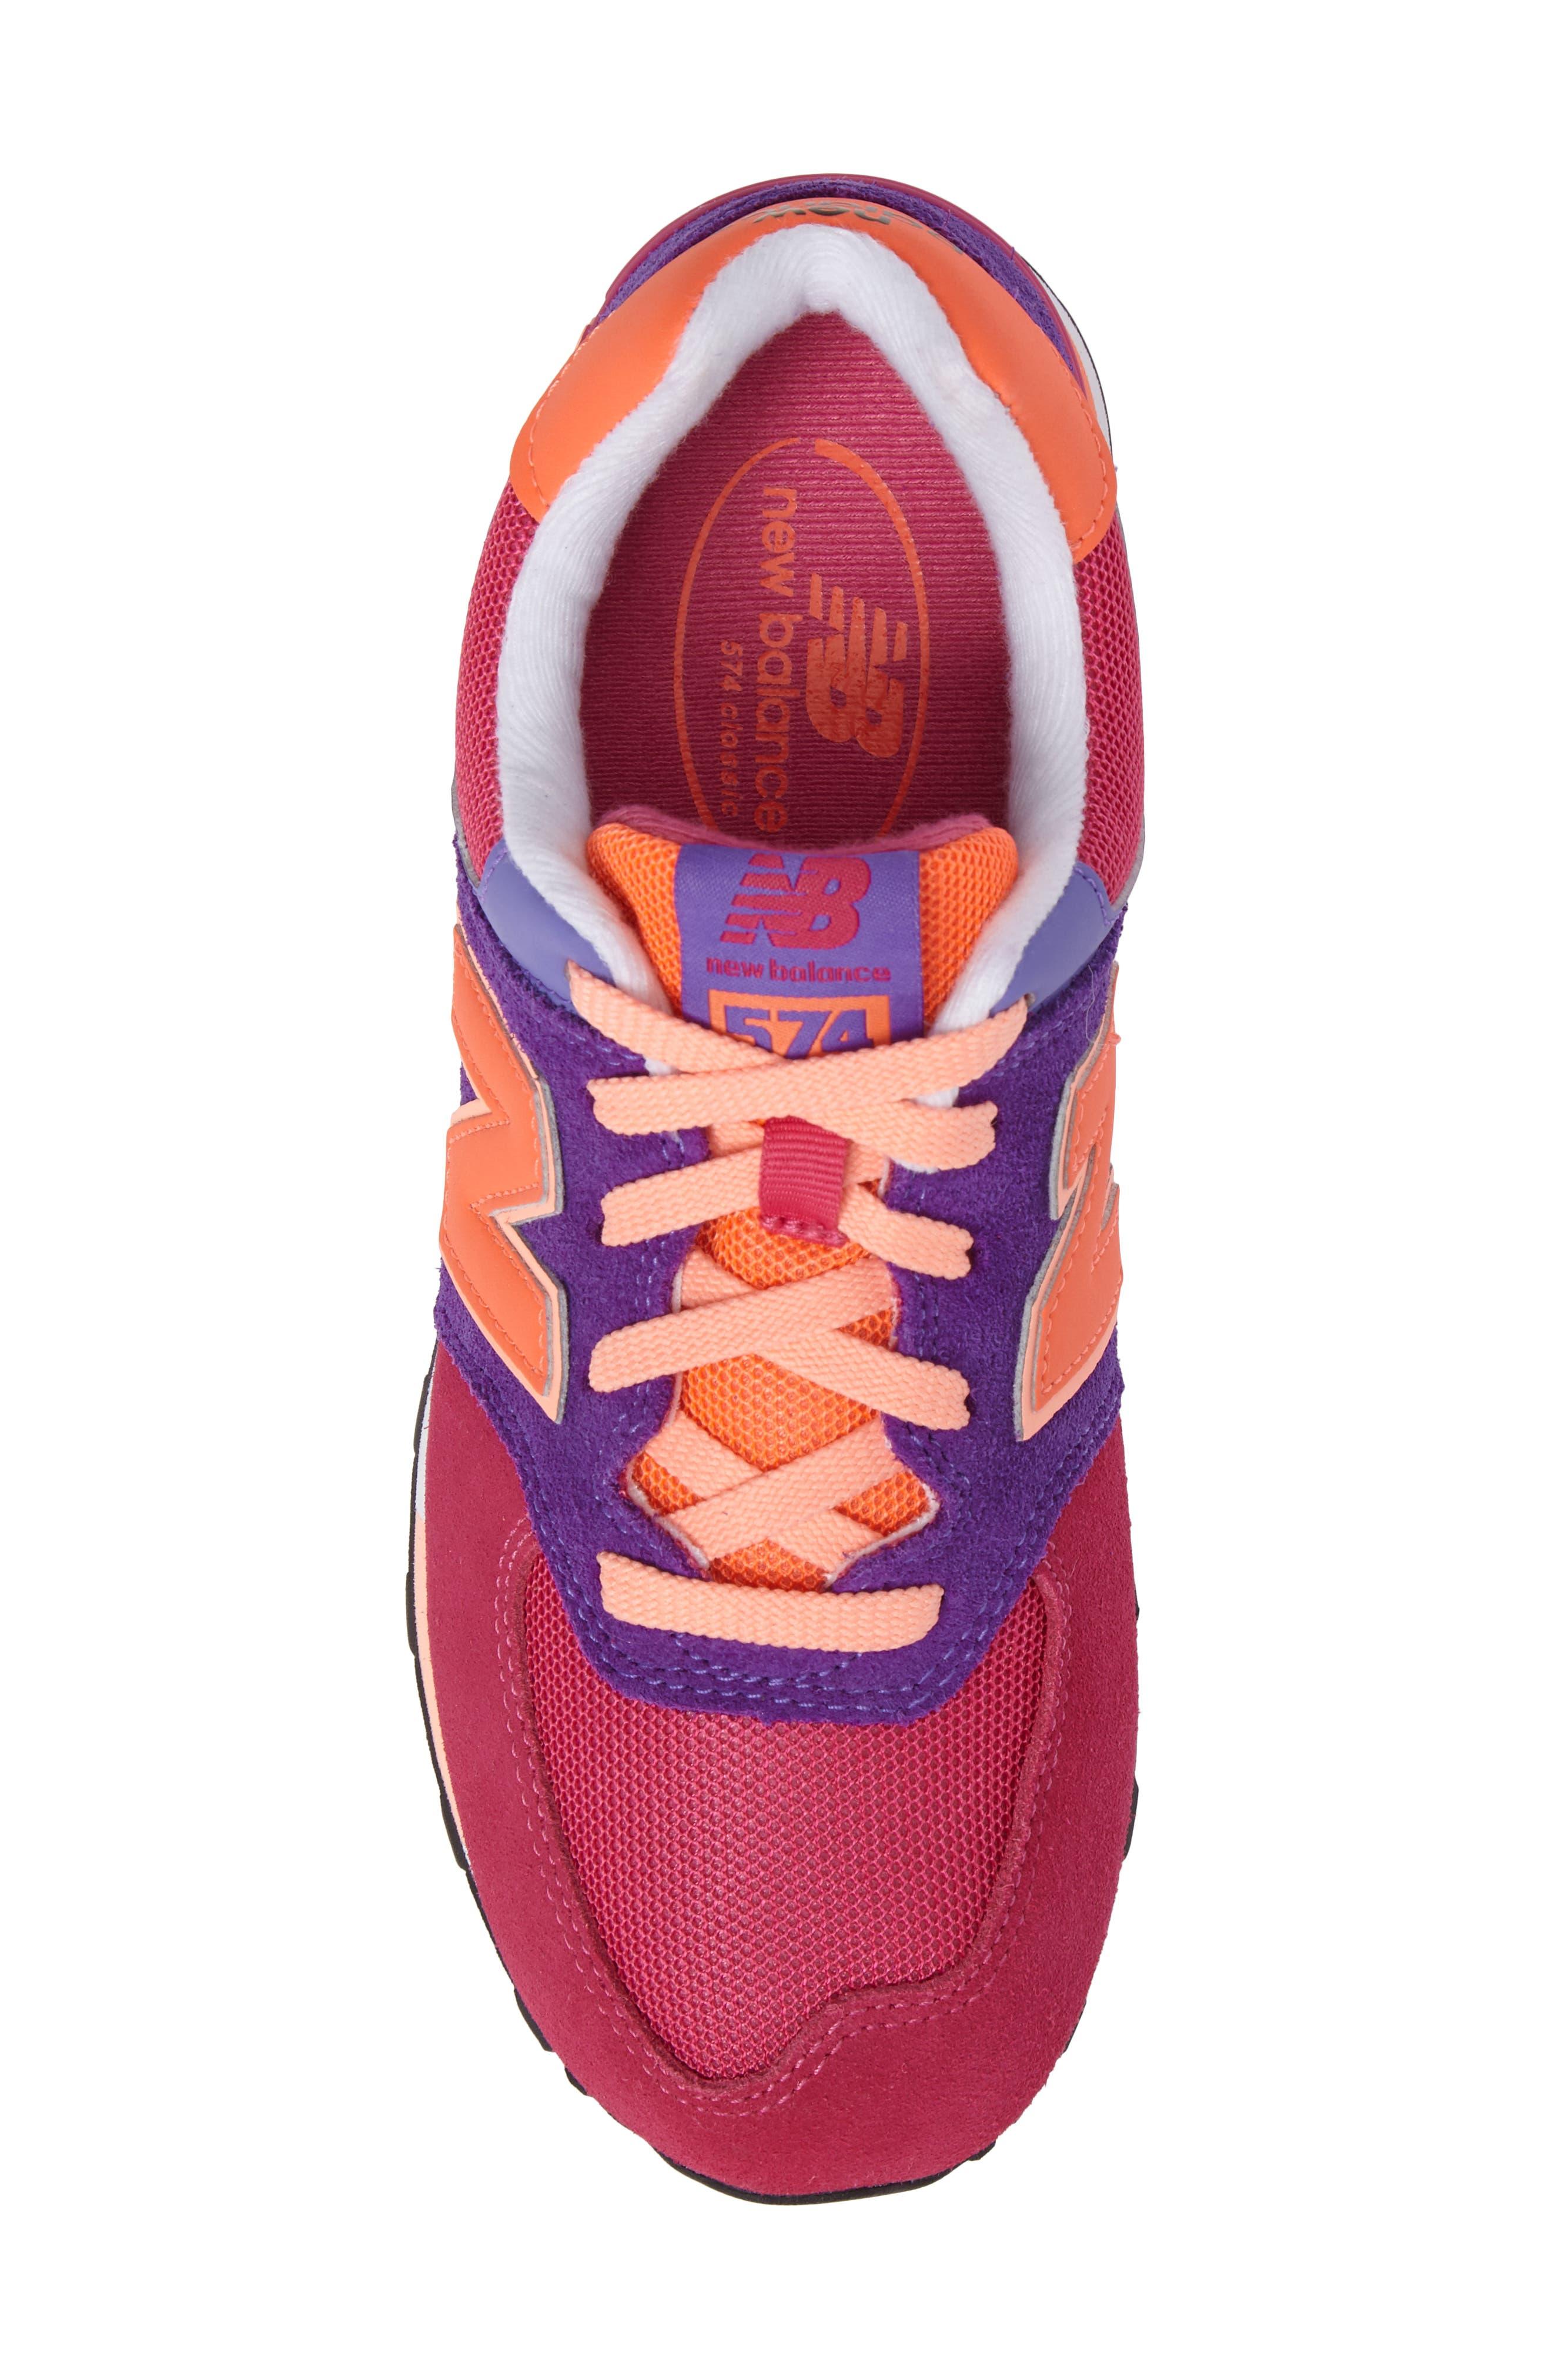 574 Cut & Paste Sneaker,                             Alternate thumbnail 5, color,                             655